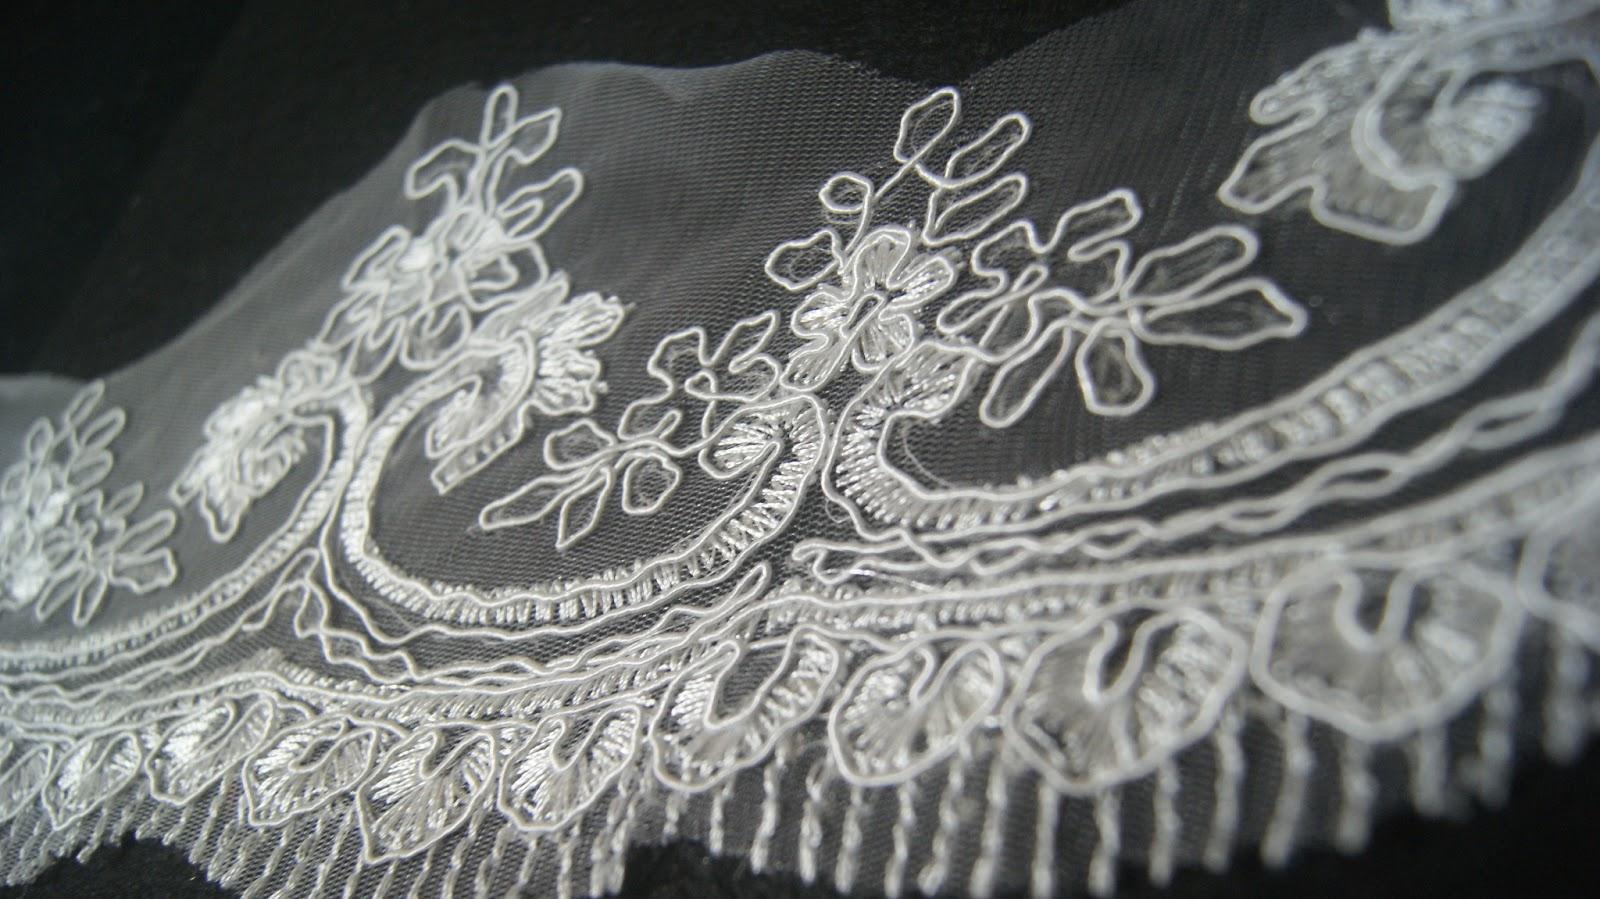 new Border lace cantik & murah available! RM 15 semeter!